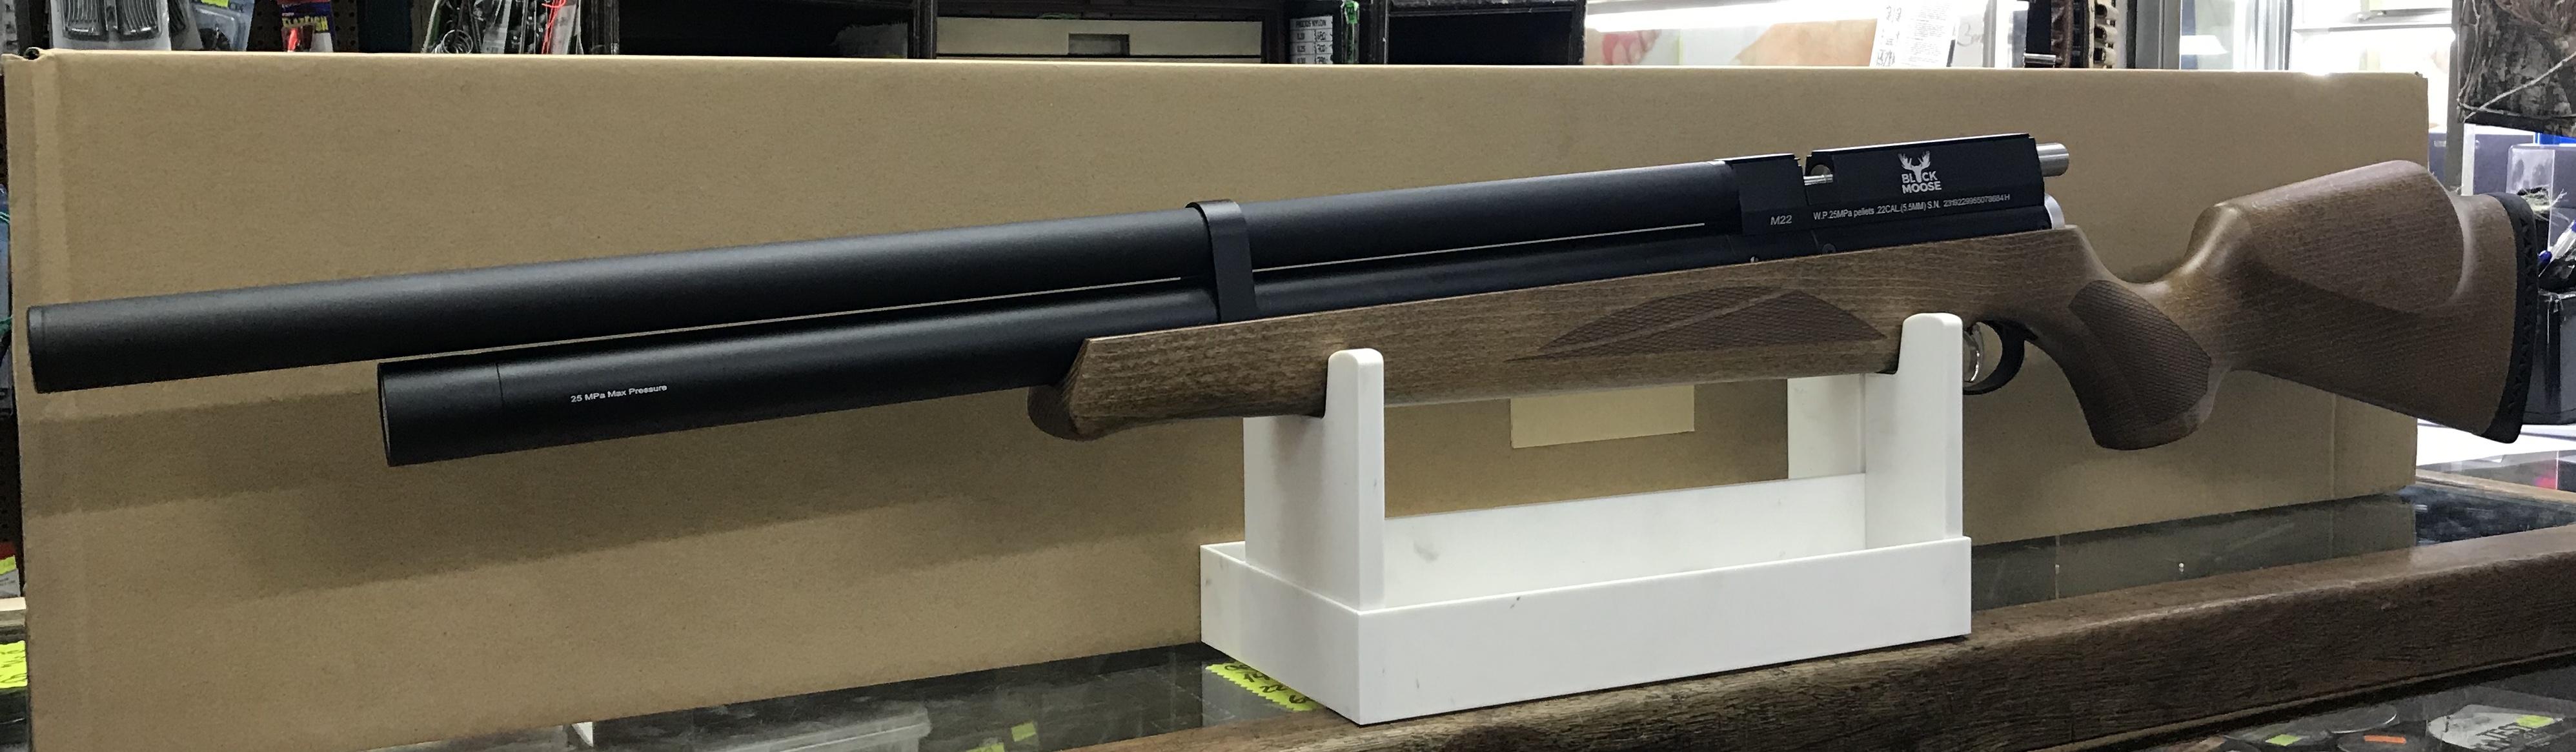 Rifle PCP Artemis o Black mosse M22 cal. 5,5